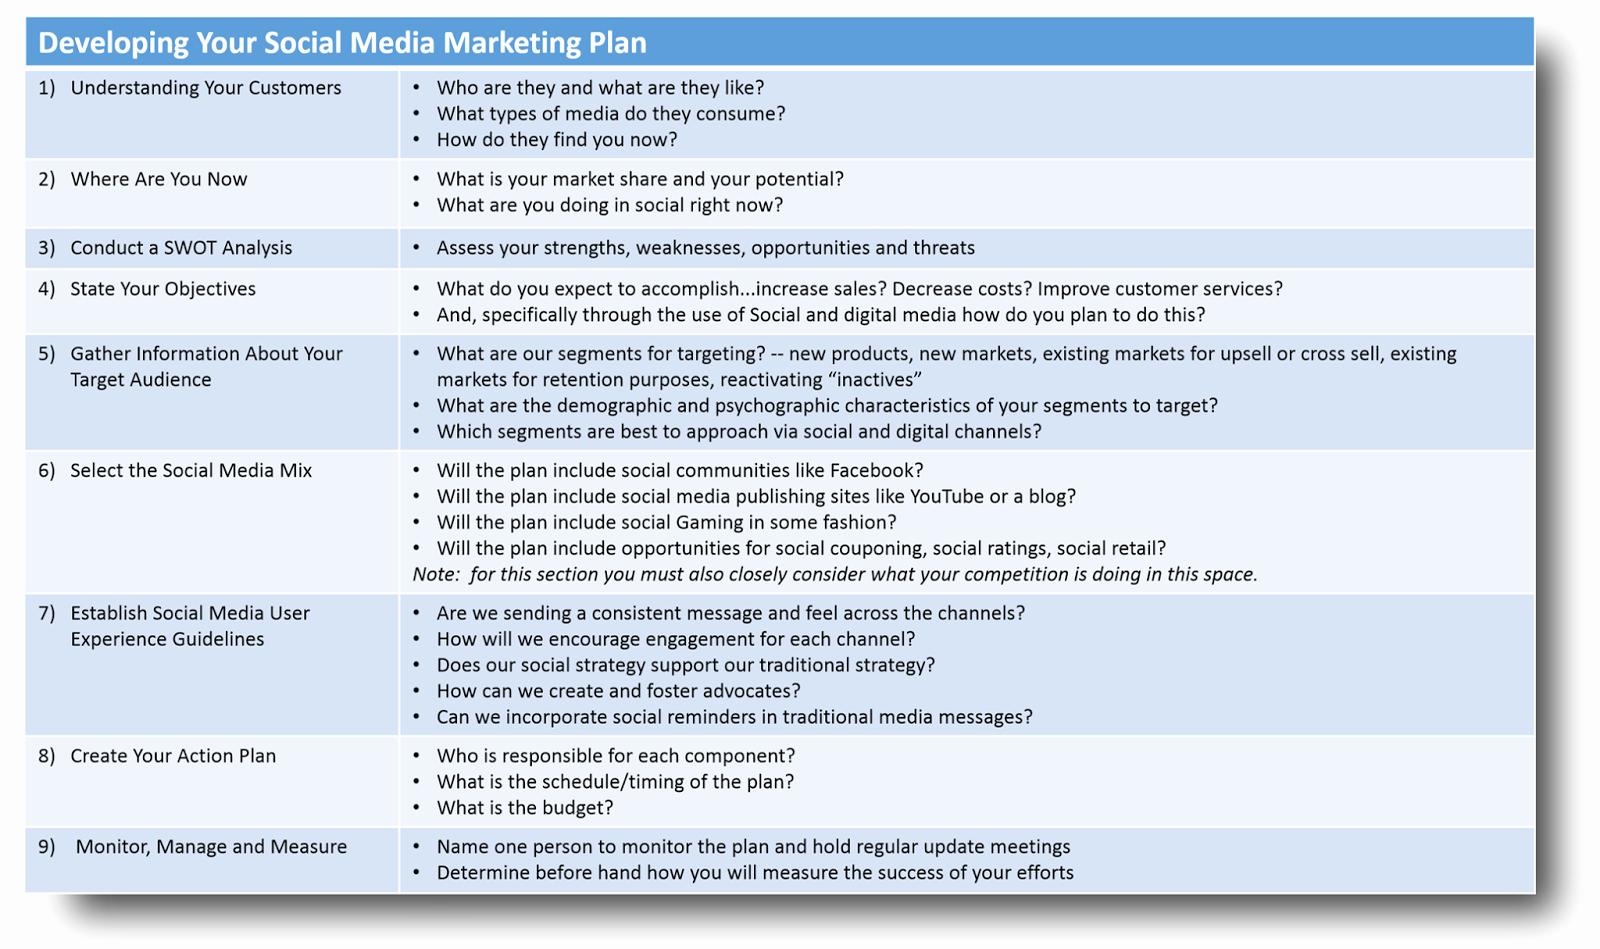 Social Media Marketing Proposal Best Of Developing Your social Media Marketing Plan